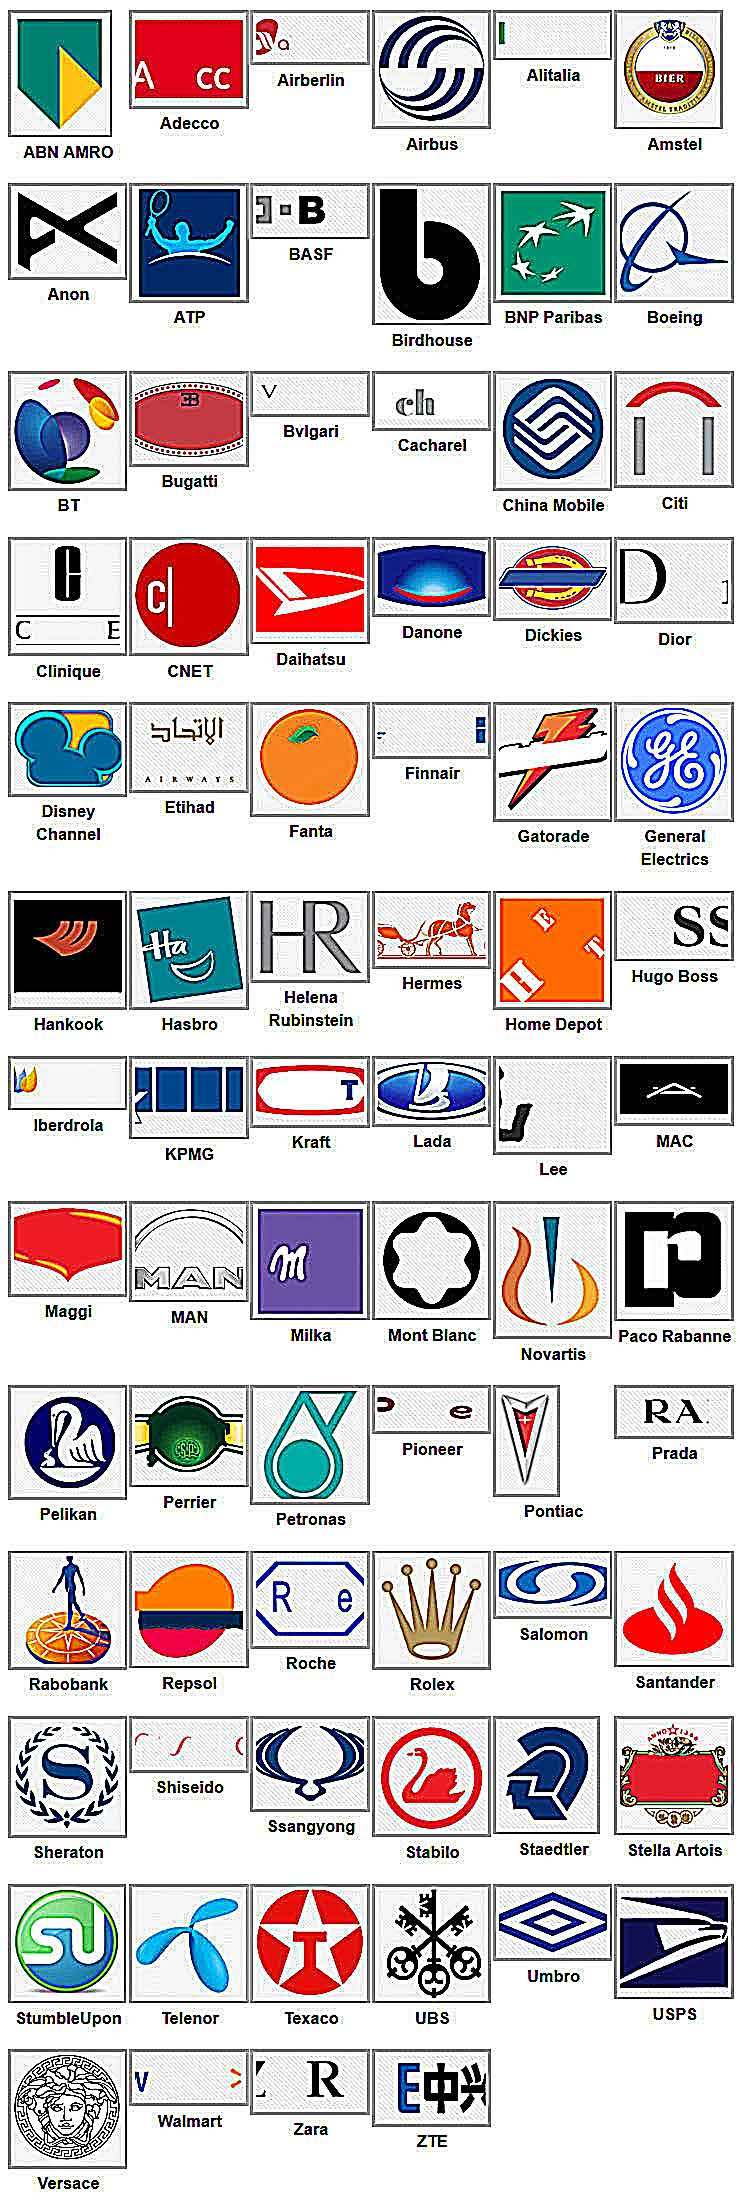 Logo Game Answers Level 6 : answers, level, Answers, Level, Cheats, Quiz,, Answers,